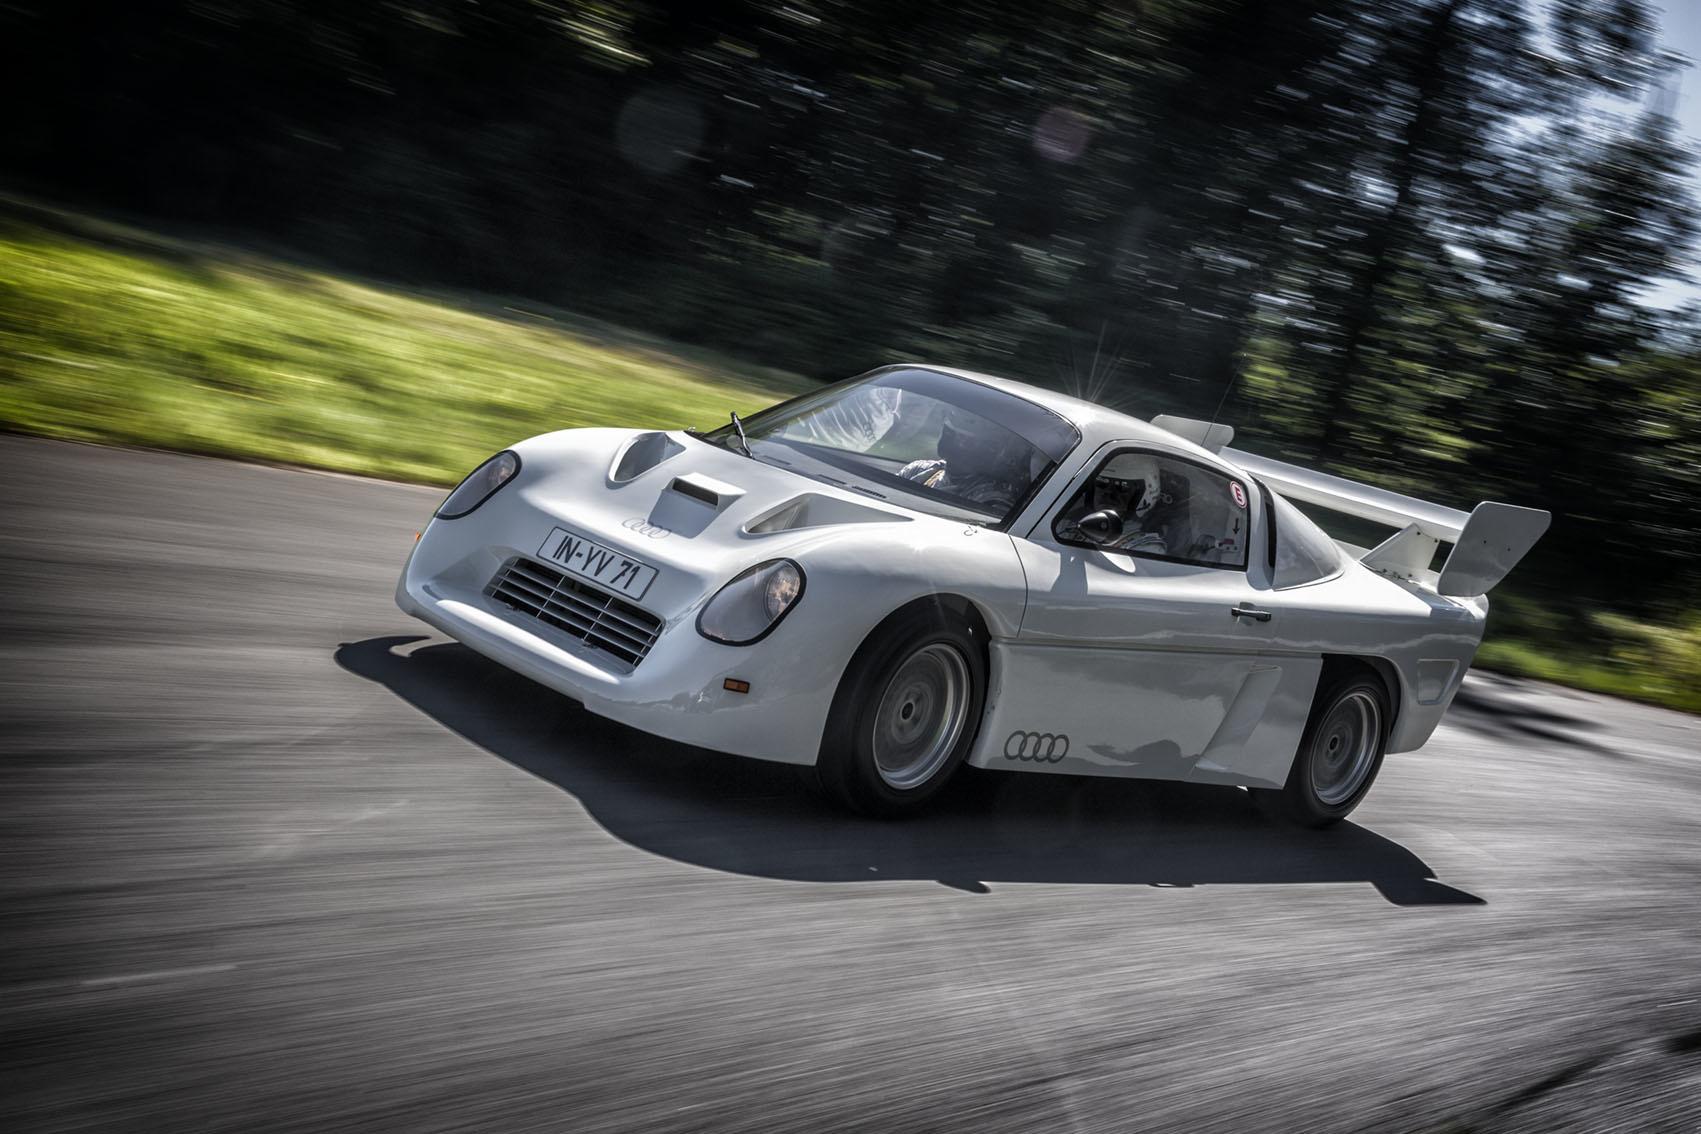 Audi Rallye Gruppe S